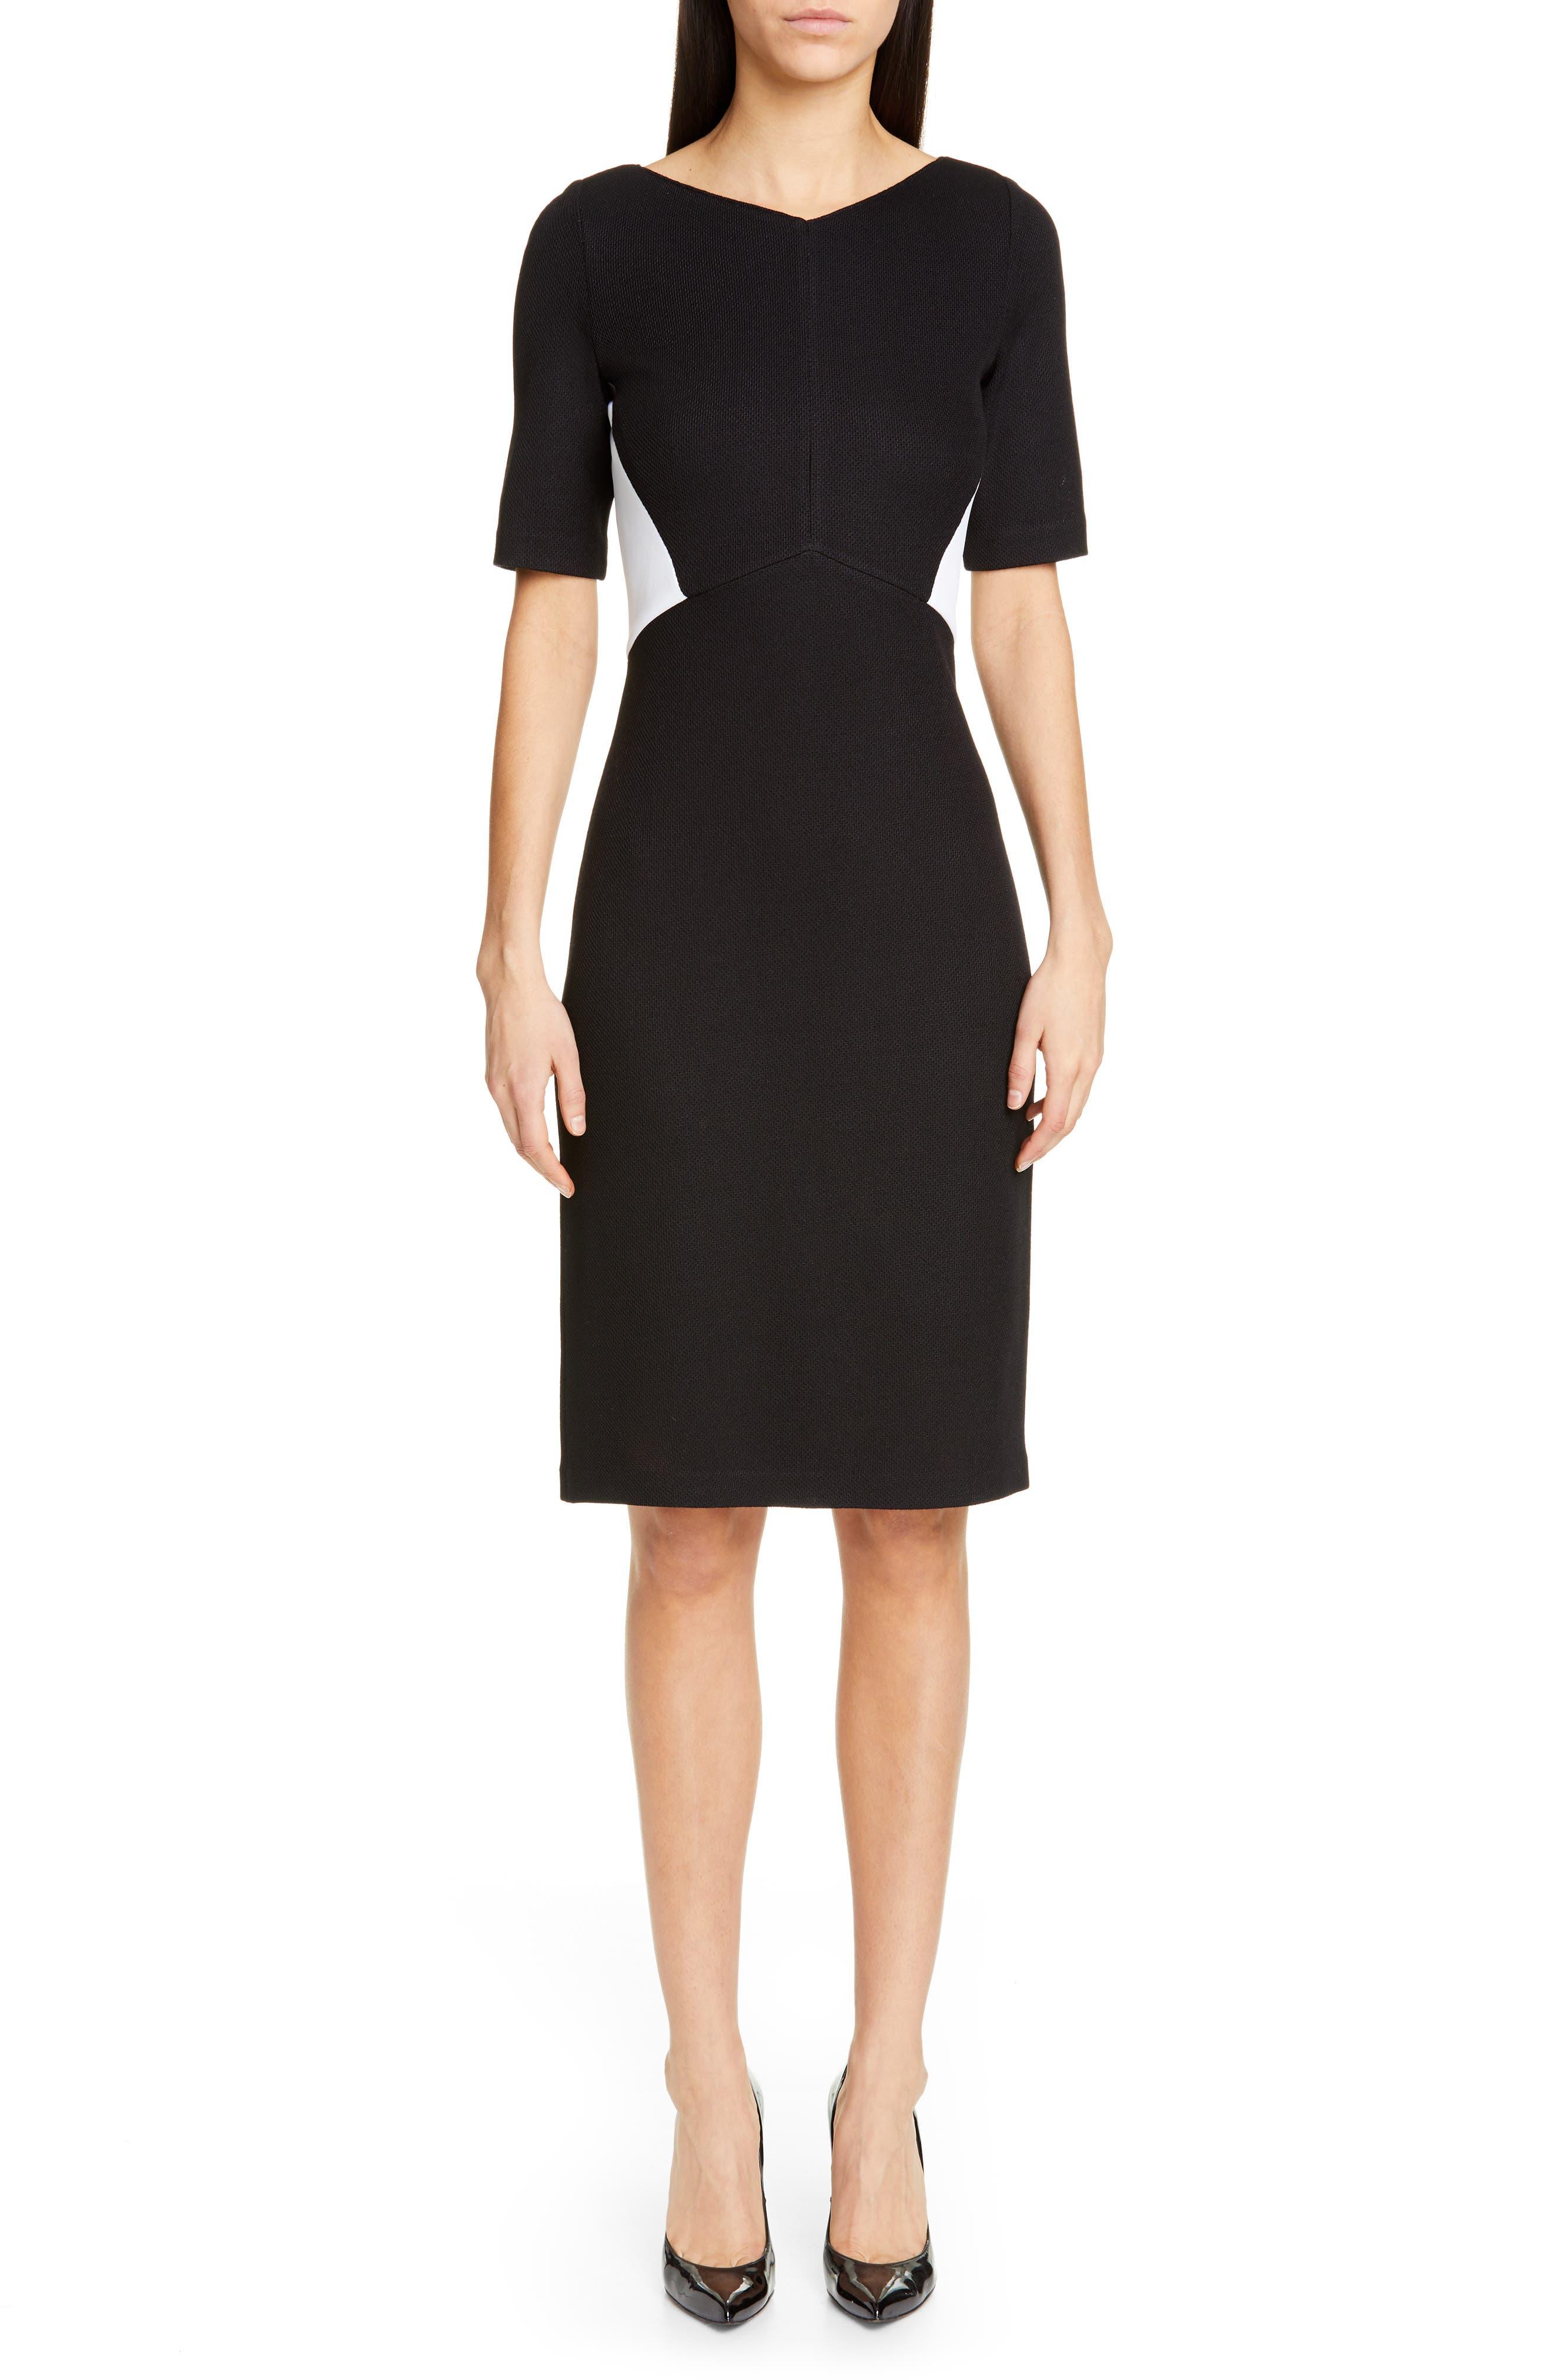 ST. JOHN COLLECTION, Piqué Milano Knit Dress, Main thumbnail 1, color, CAVIAR/ BIANCO